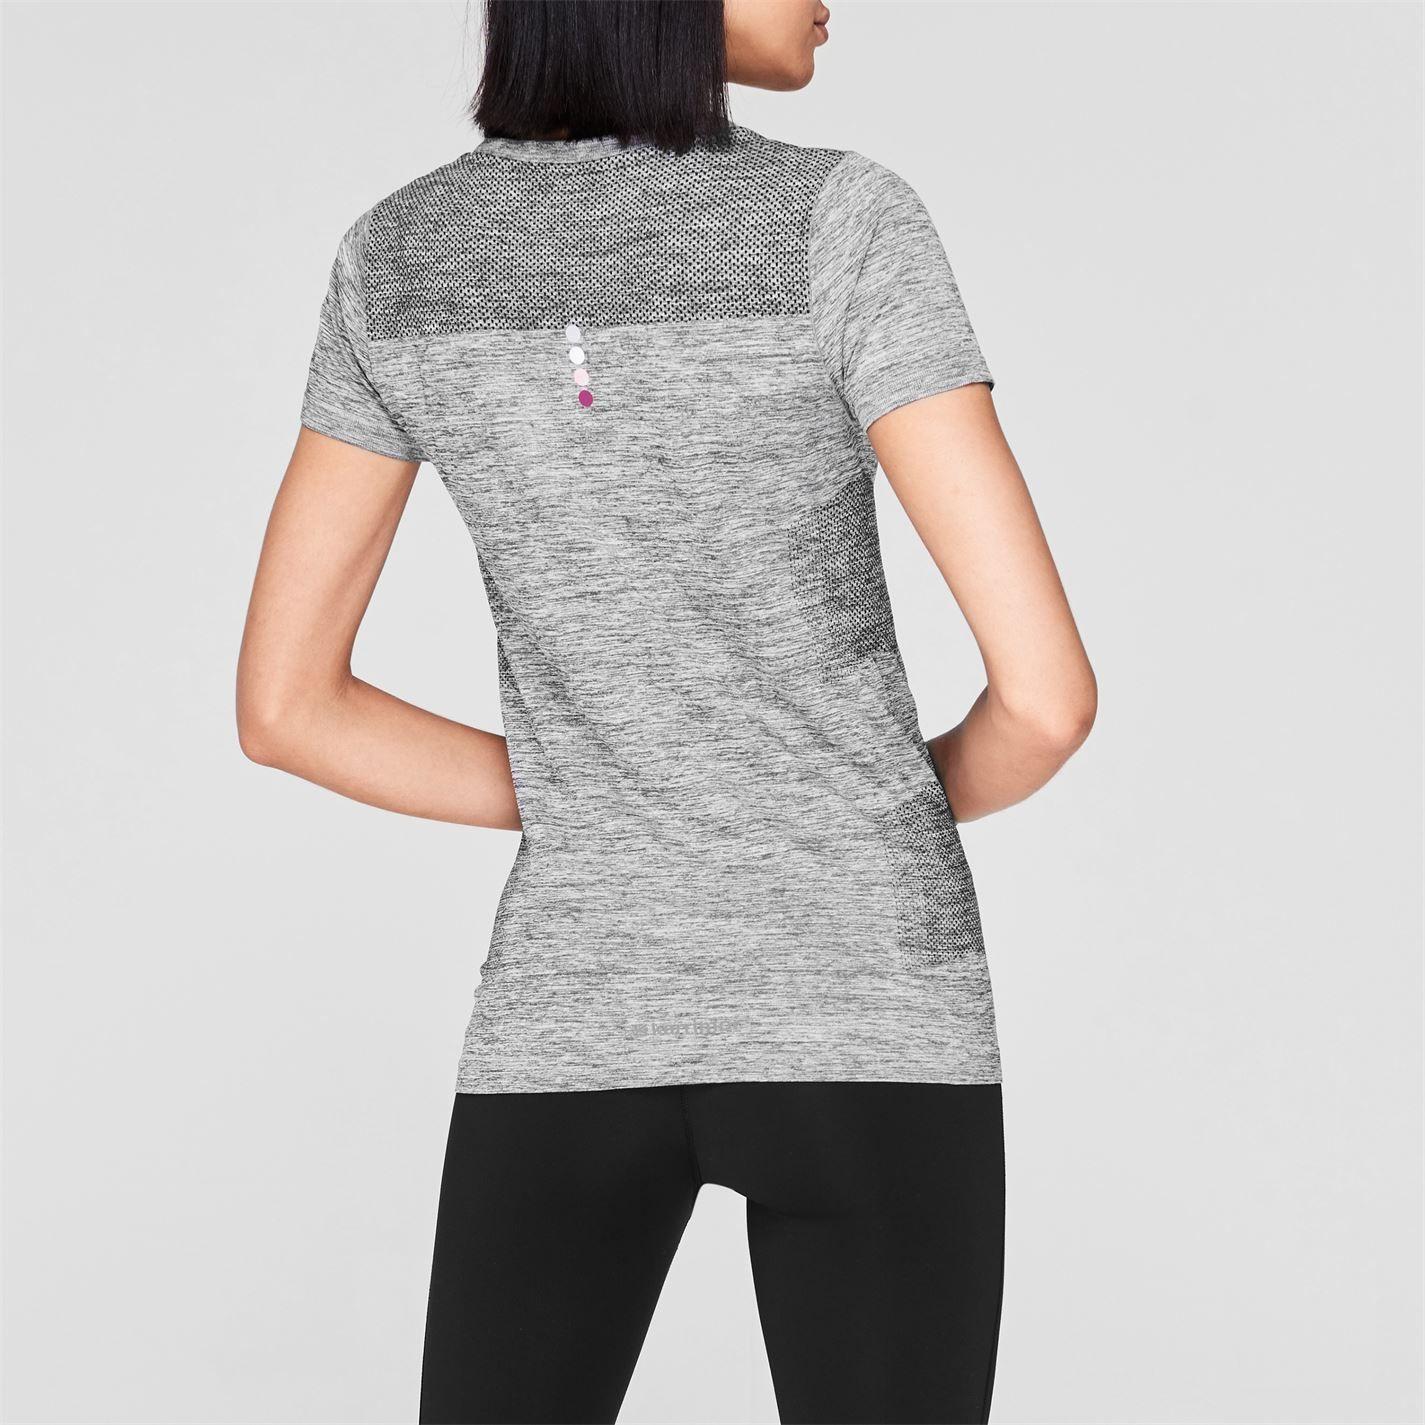 Karrimor Womens X Rapid T Shirt Short Sleeve Performance Tee Top Crew Neck